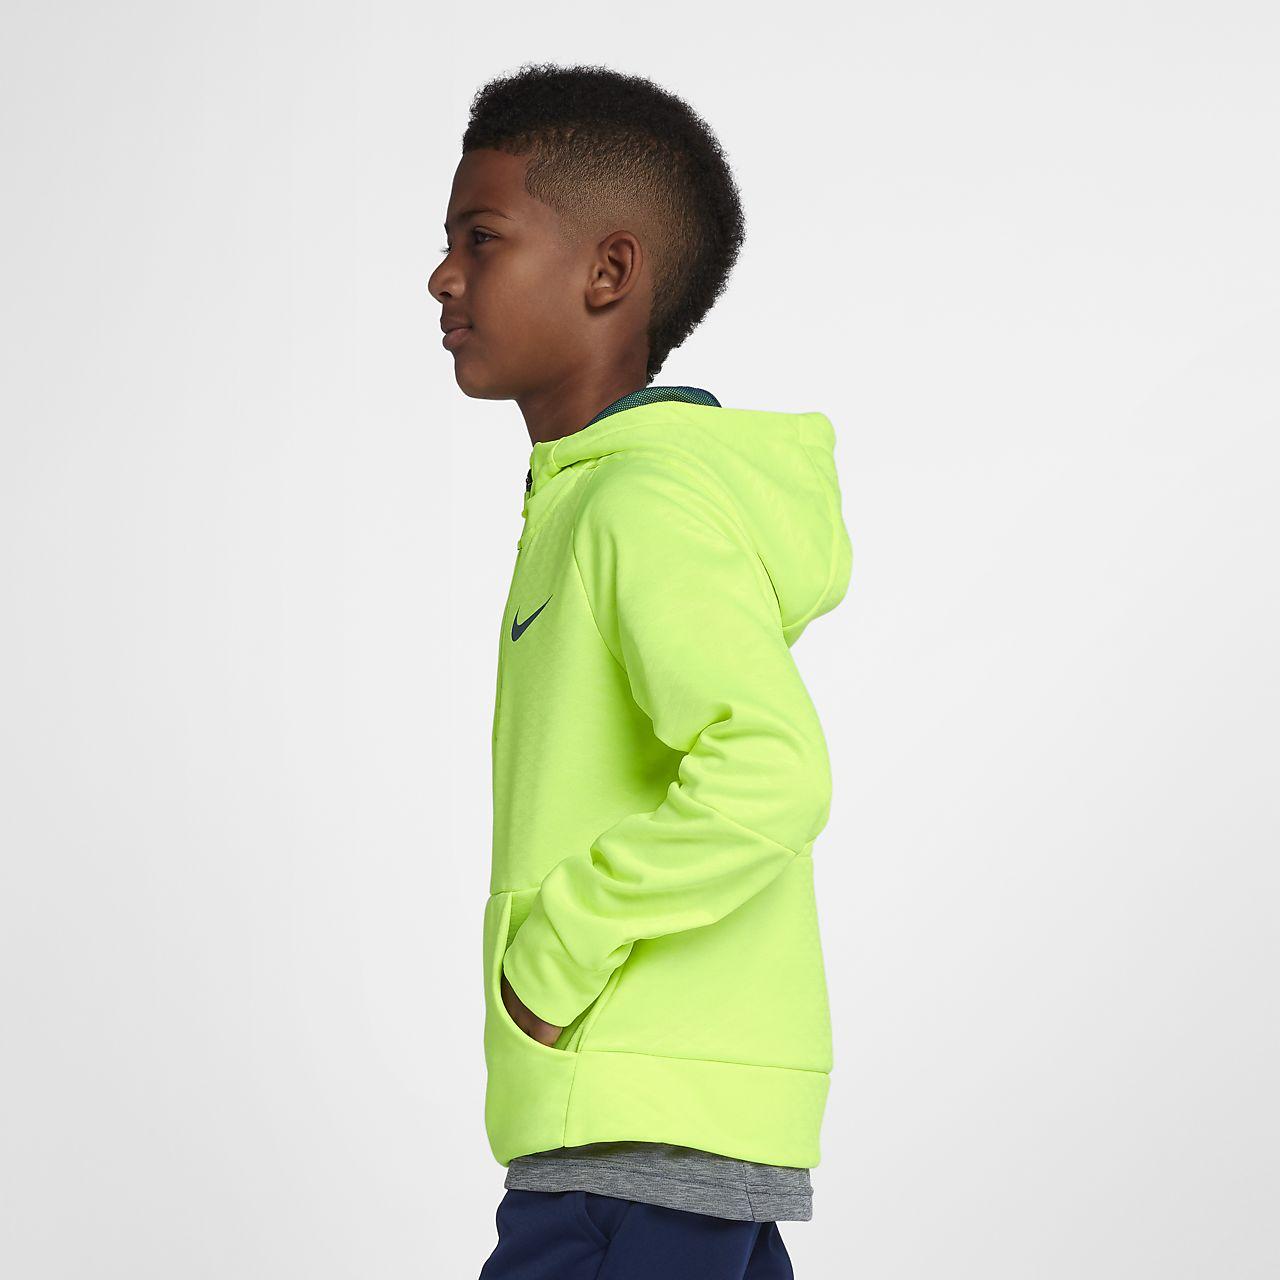 7d84bd1d8256 Nike Dri-FIT Therma Big Kids  (Boys ) Half-Zip Training Hoodie. Nike.com